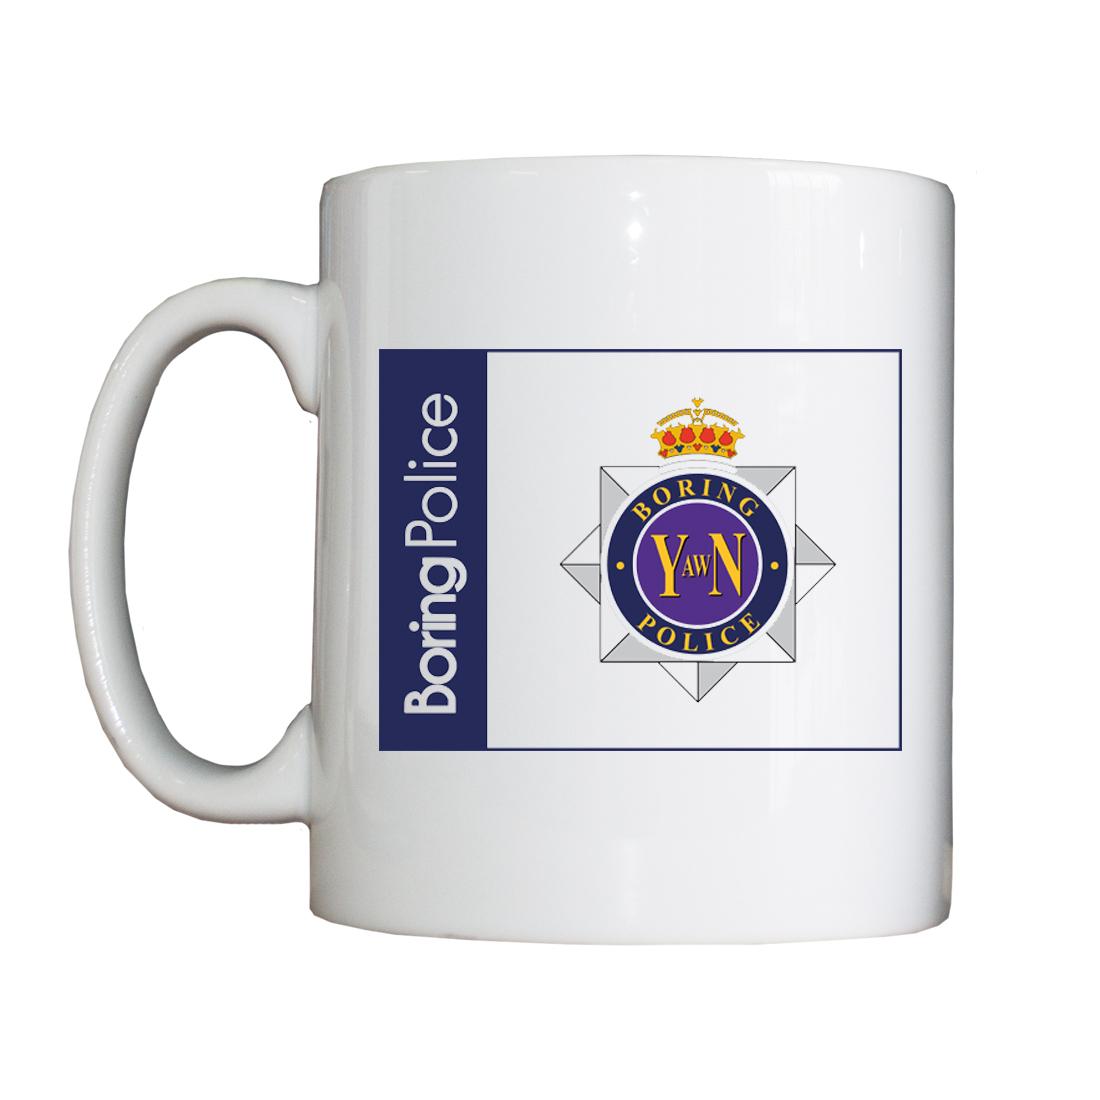 Personalised 'Boring' Drinking Vessel (Mug) BoringMug